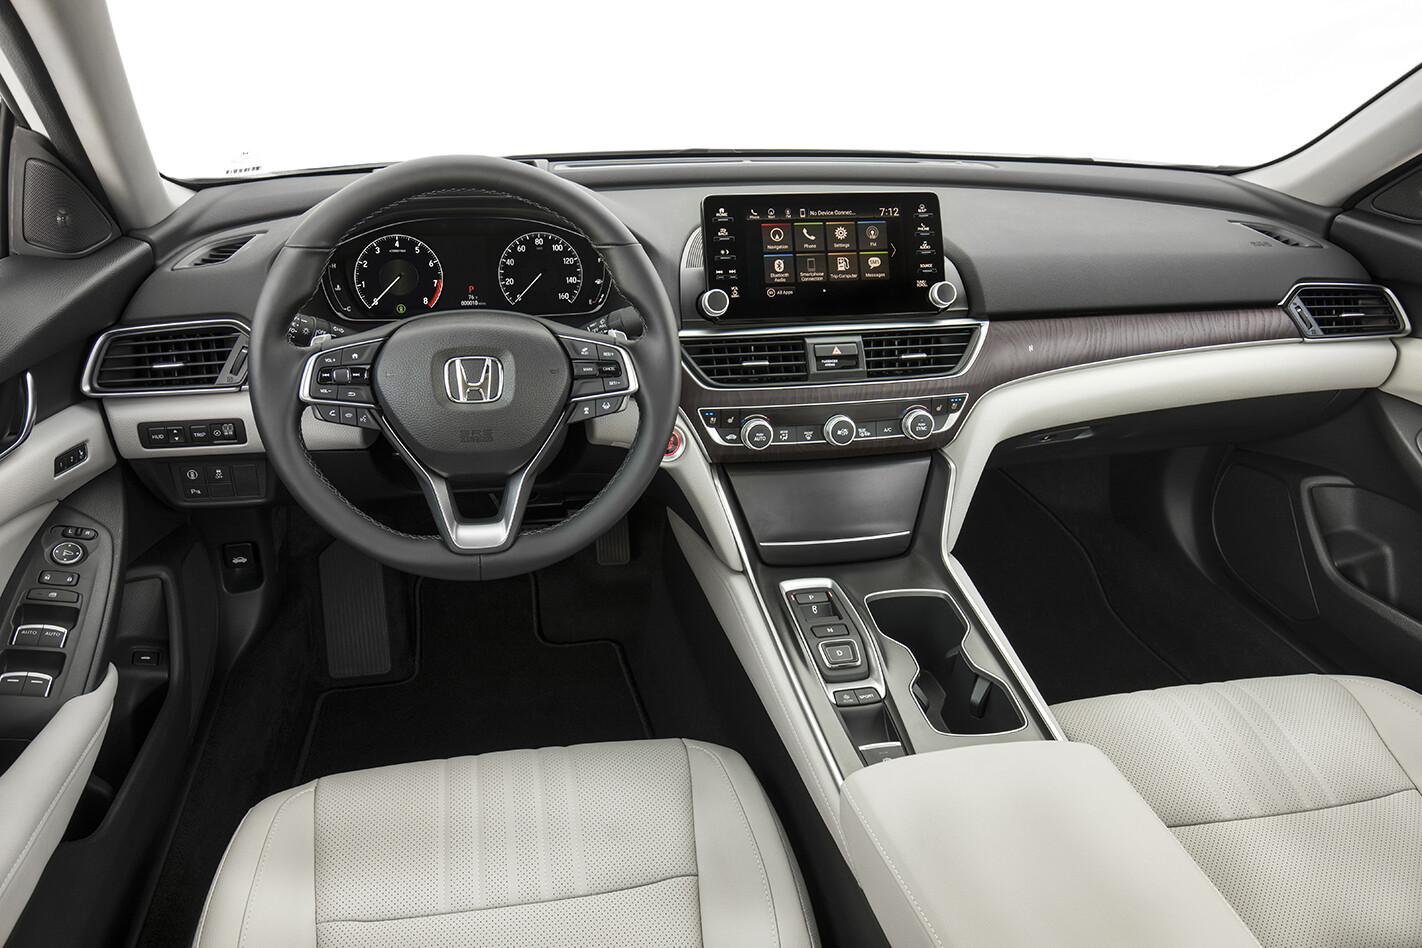 2018 Honda Accord USA Interior Dash Jpg